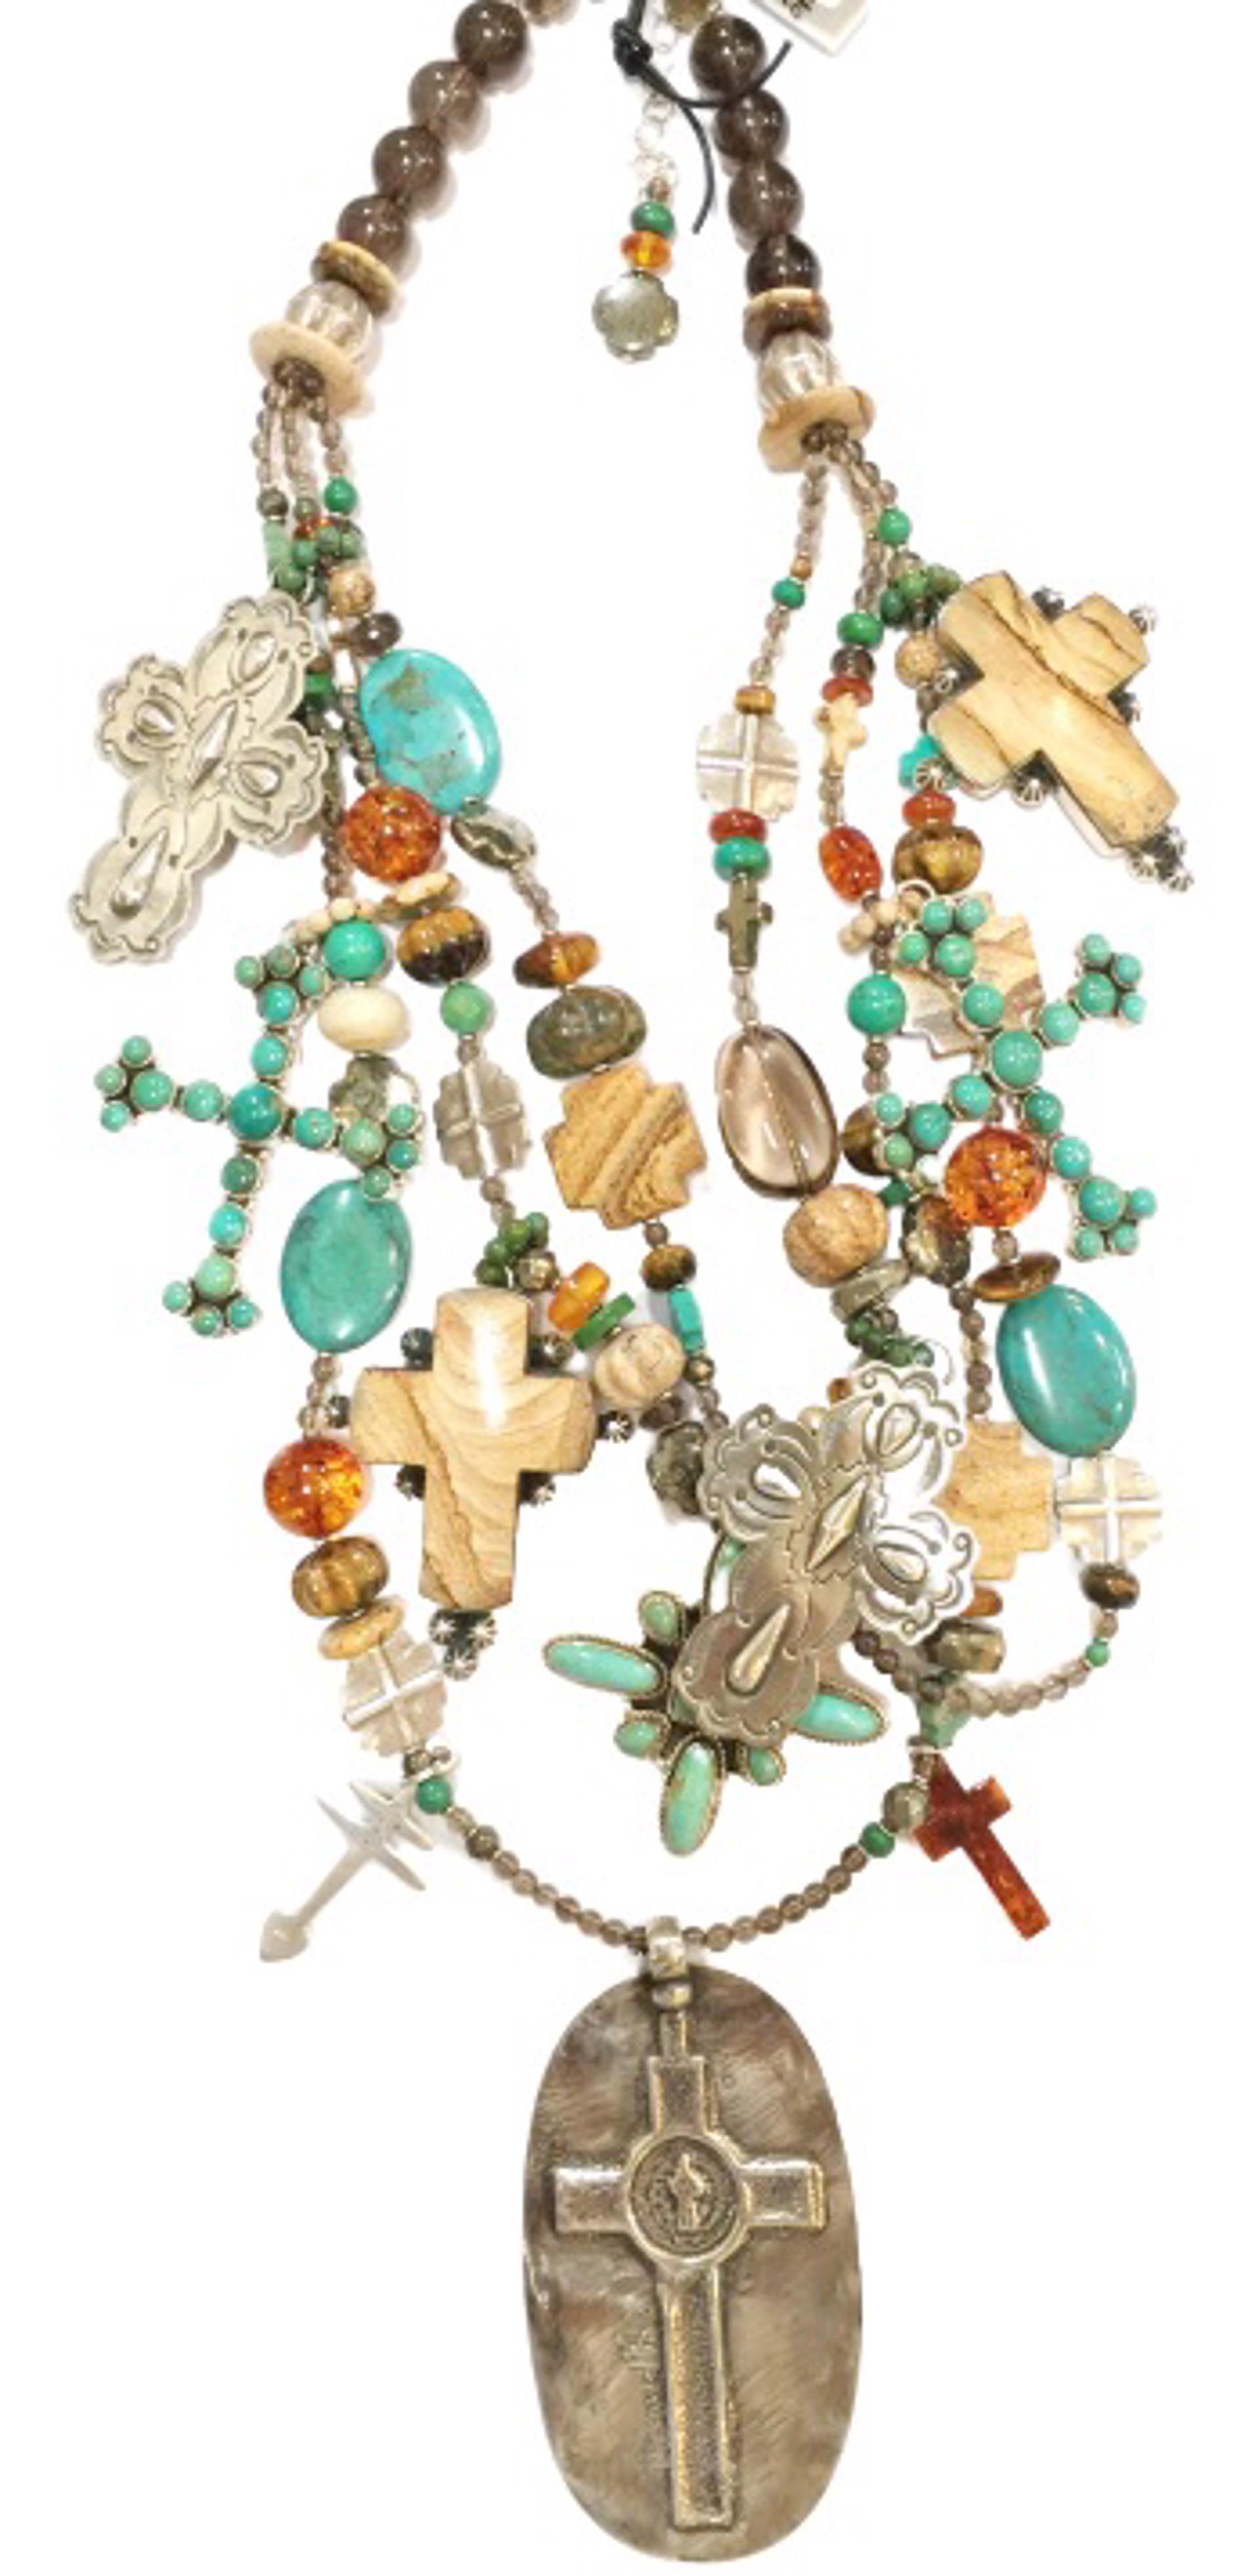 KY 1351C - 3 Strand Cross Necklace, Smokey Quartz,Turquoise,Picture Jasper & Sterling Silver by Kim Yubeta